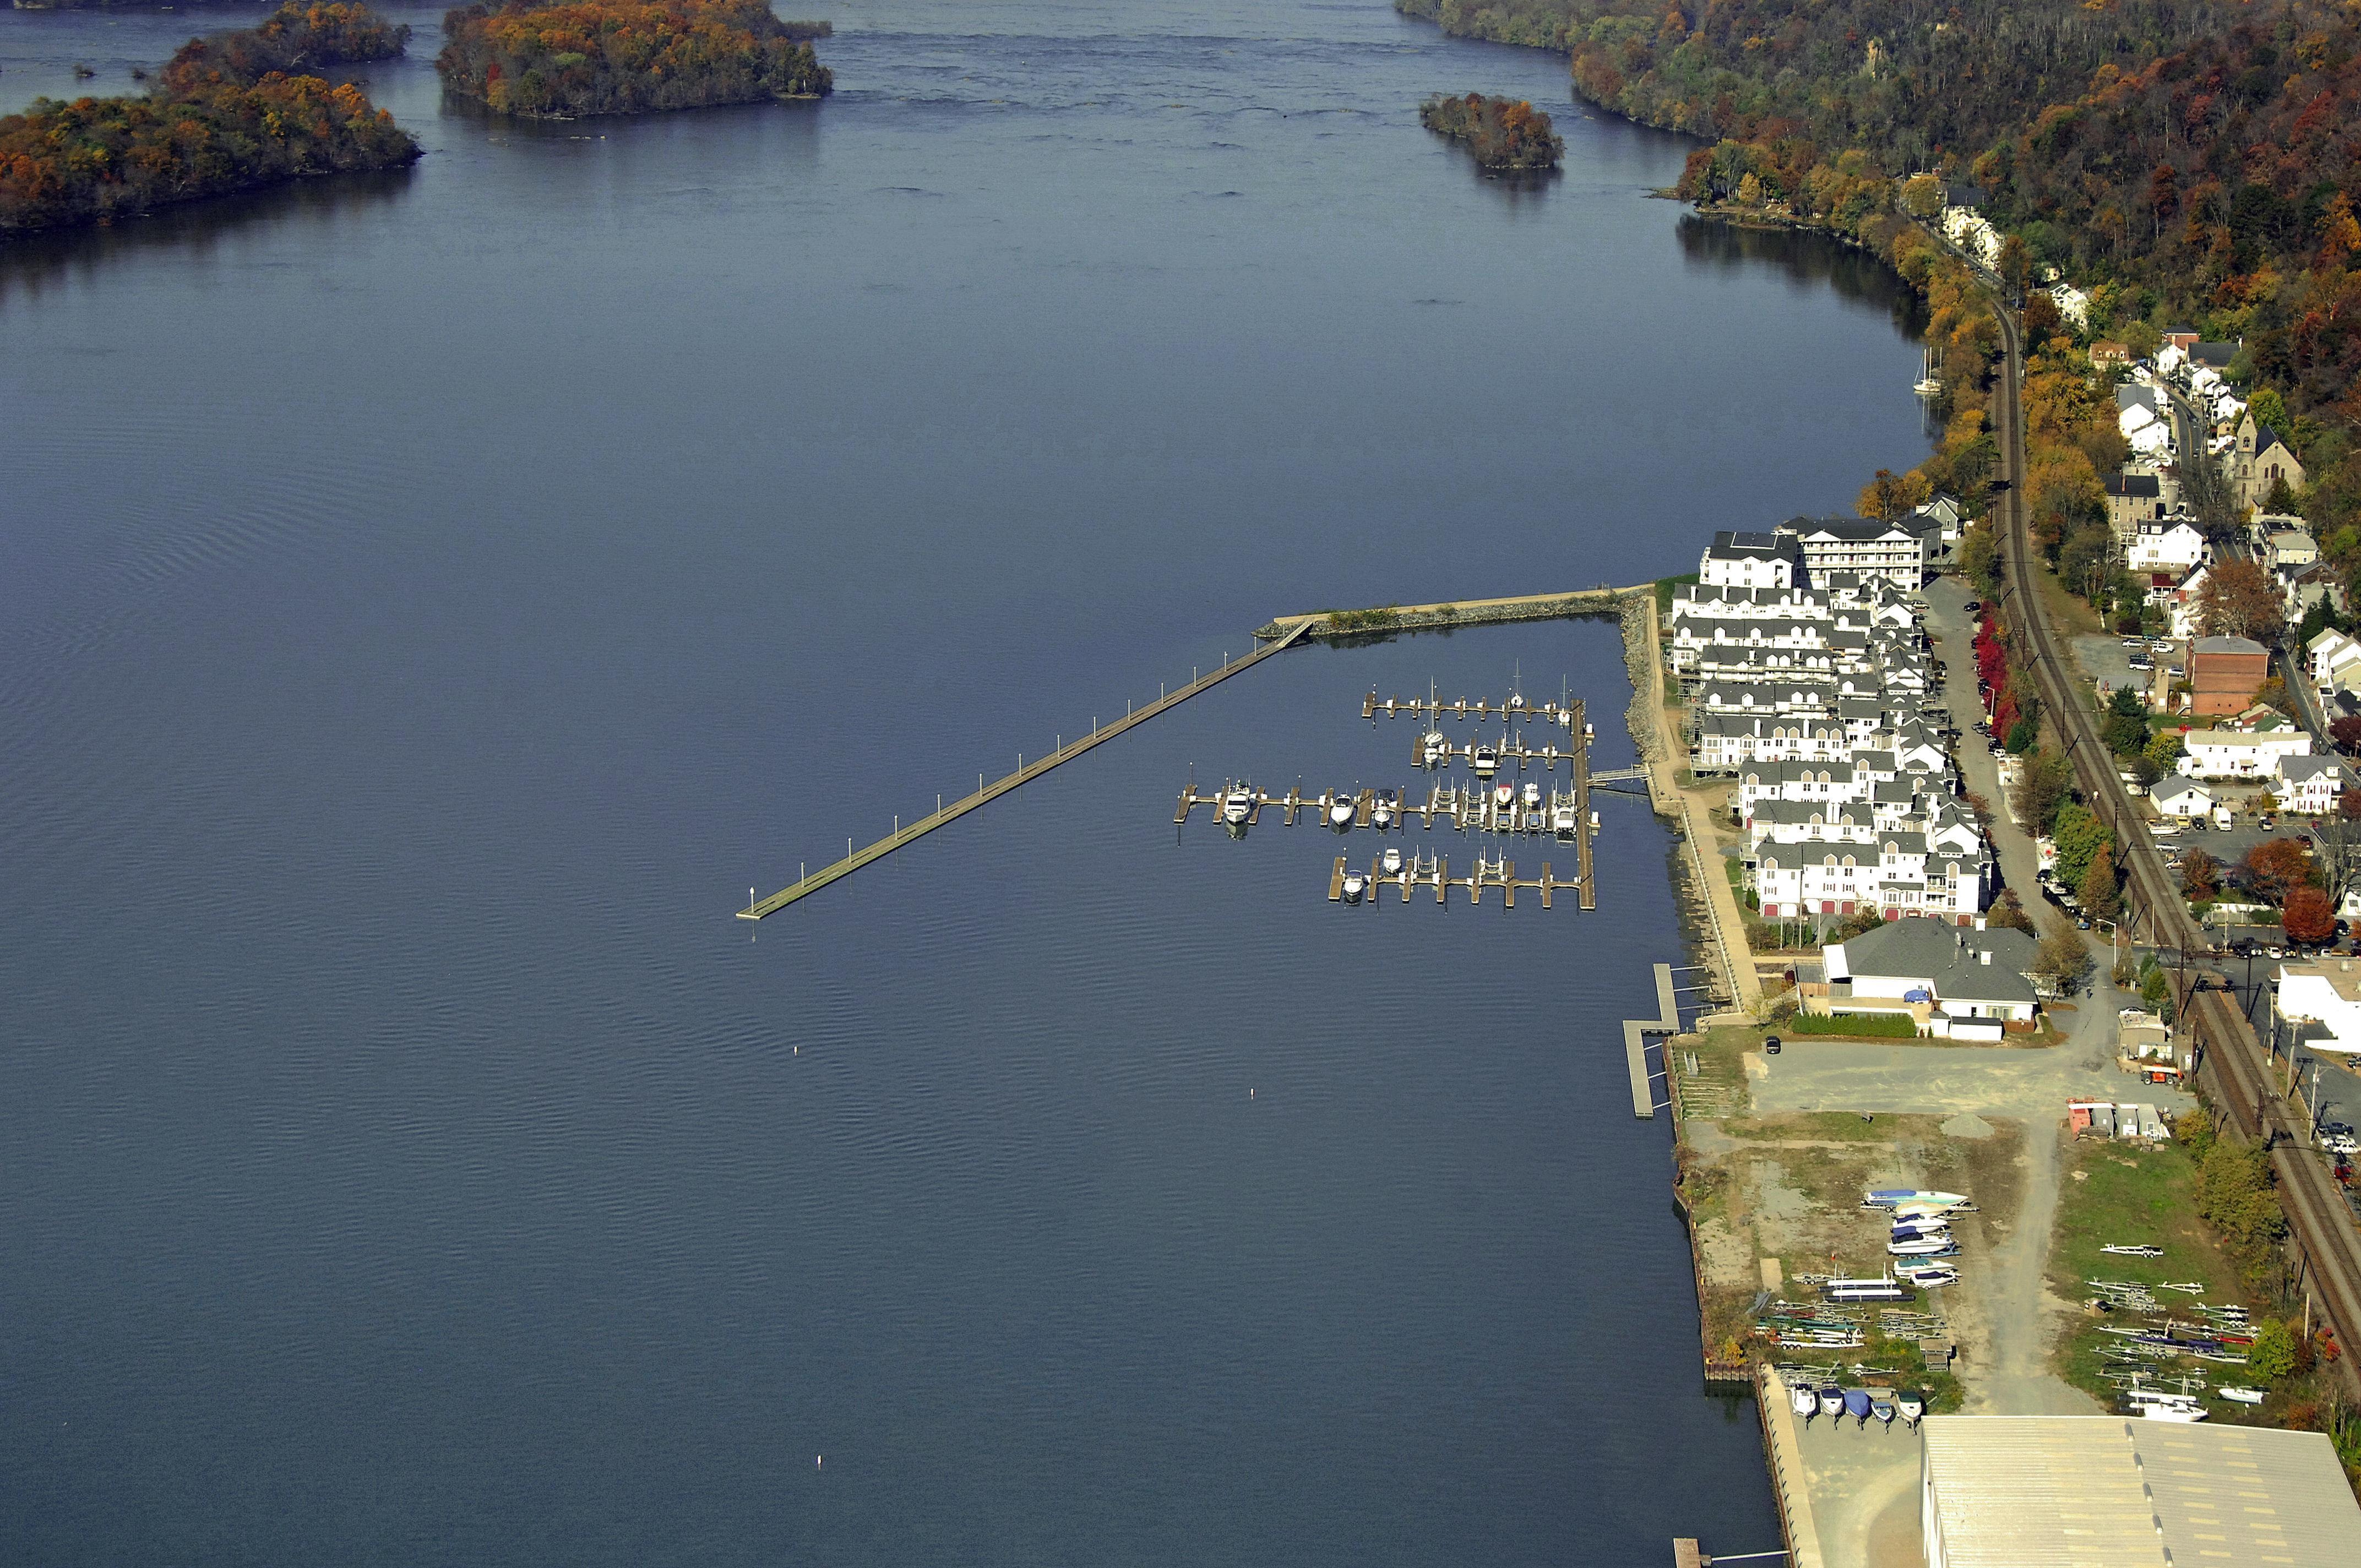 Tomes Landing Marina in Port Deposit, MD, United States